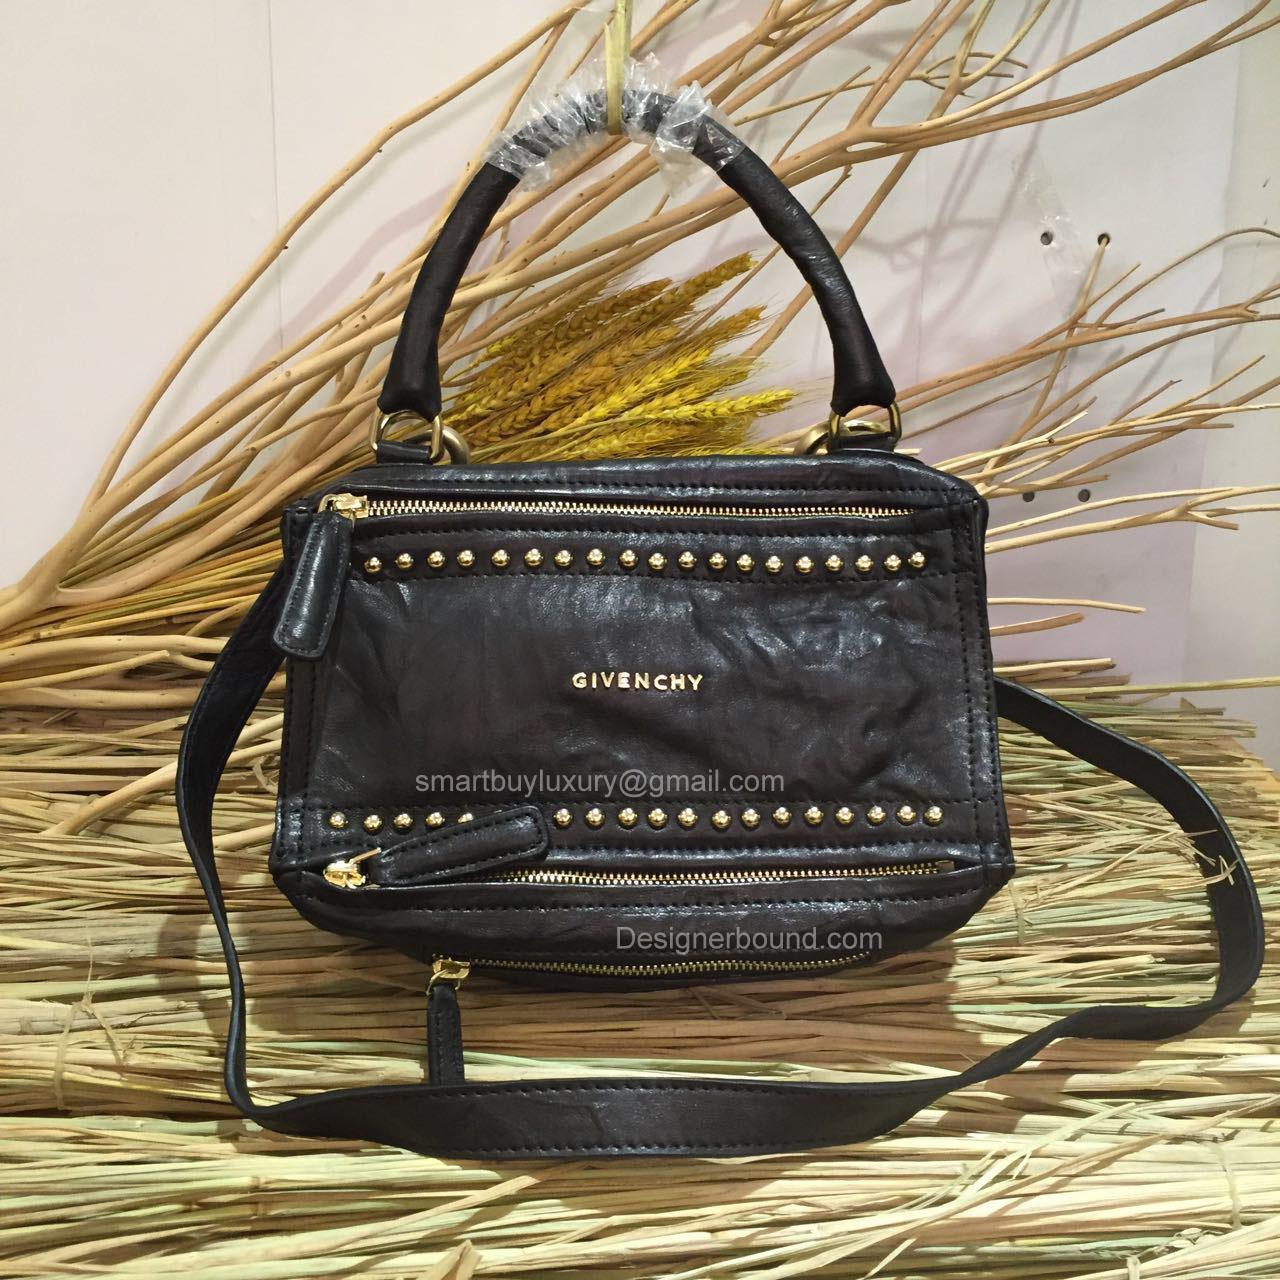 1351a658dac5 Givenchy Pepe Pandora Mini Messenger Studed Bag Black 2851721 -